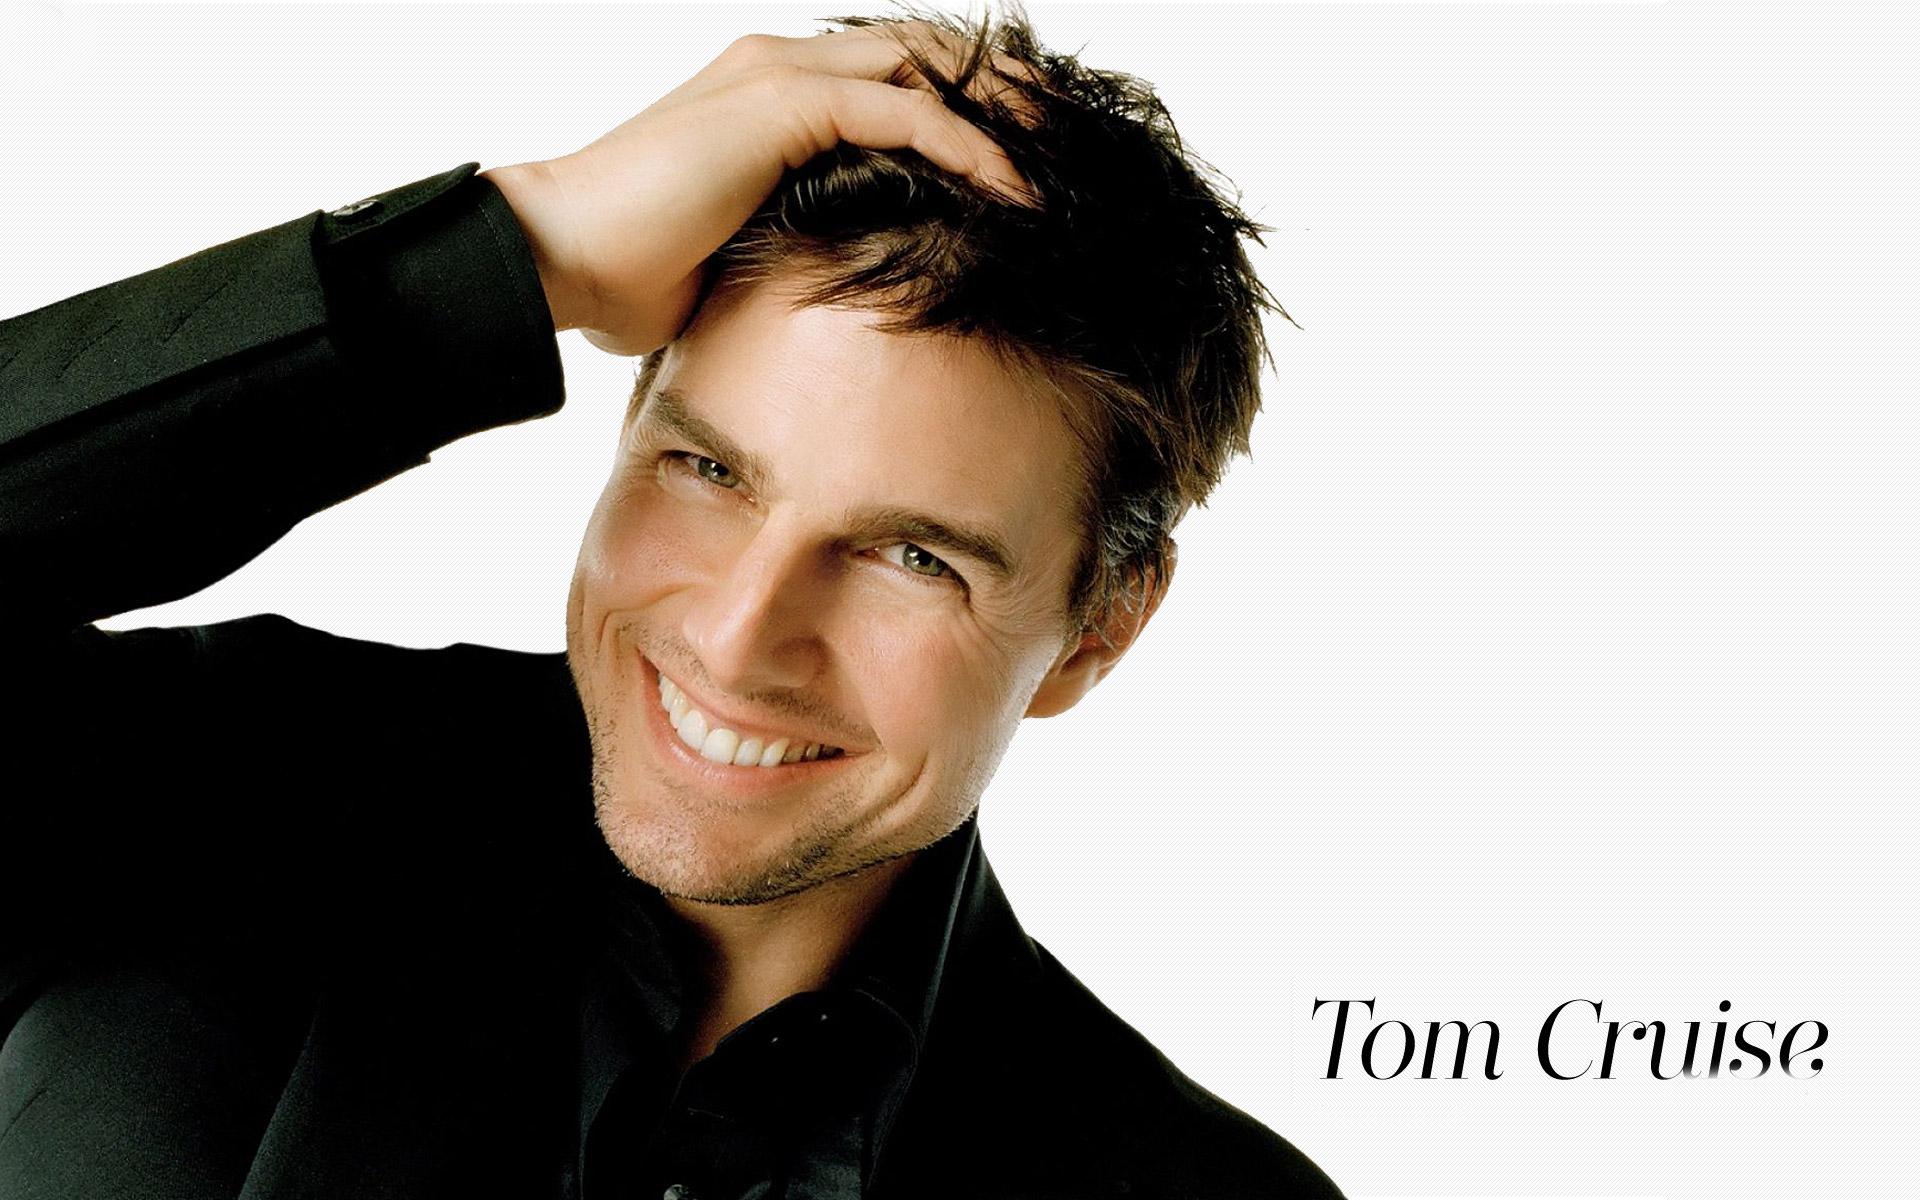 Tom Cruise HD Desktop Wallpapers 1920x1200